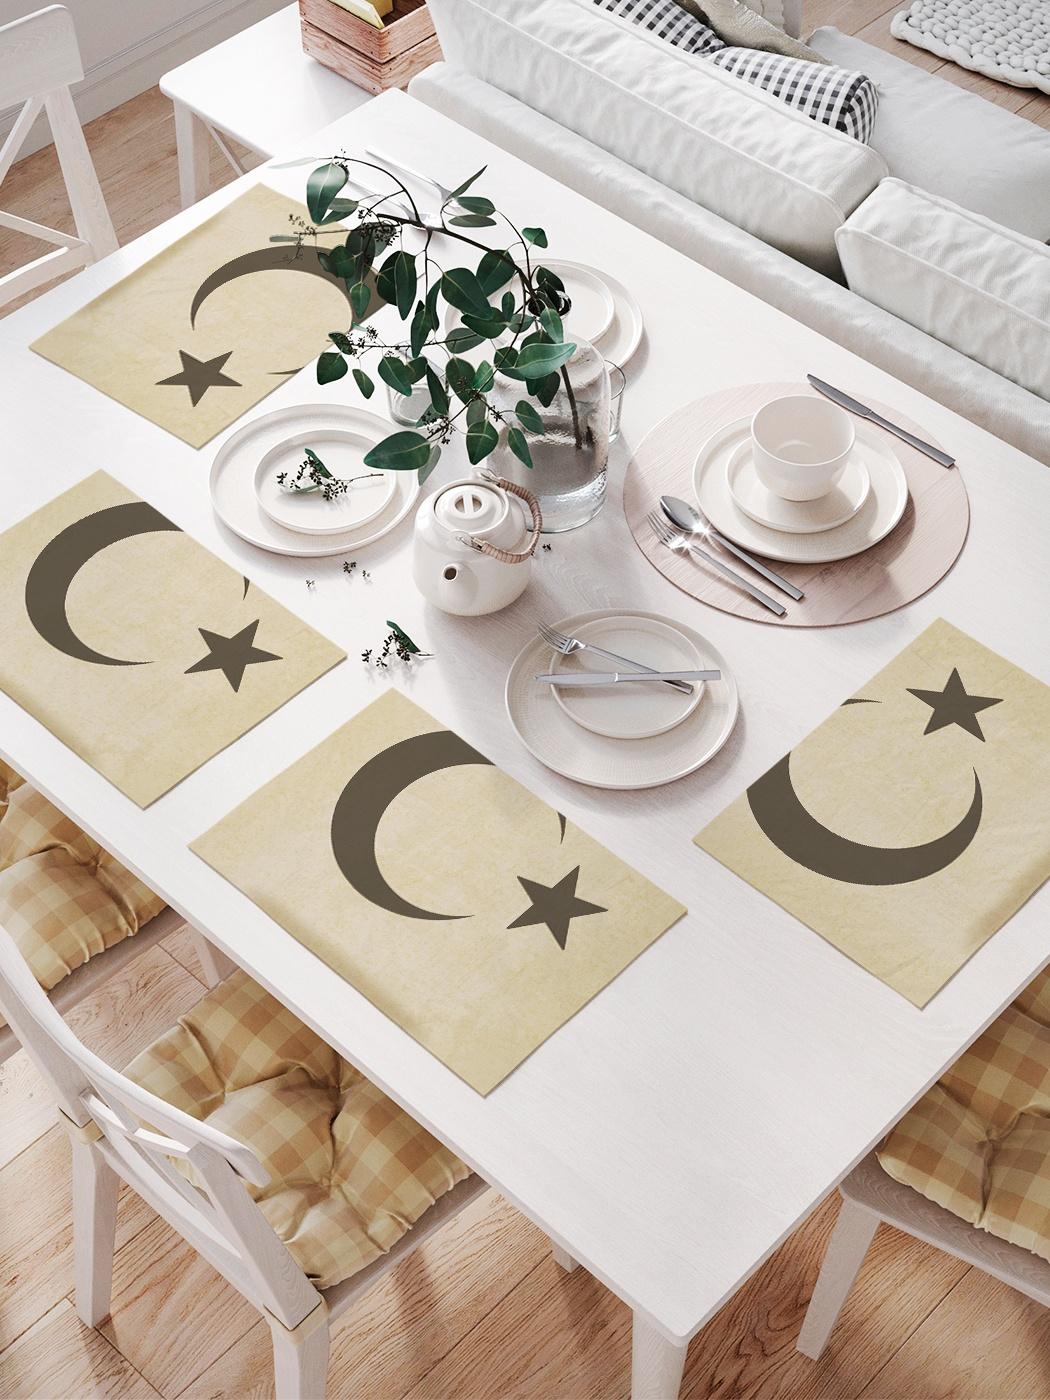 Комплект салфеток для сервировки стола «Луна и звезда» (32х46 см, 4 шт.)